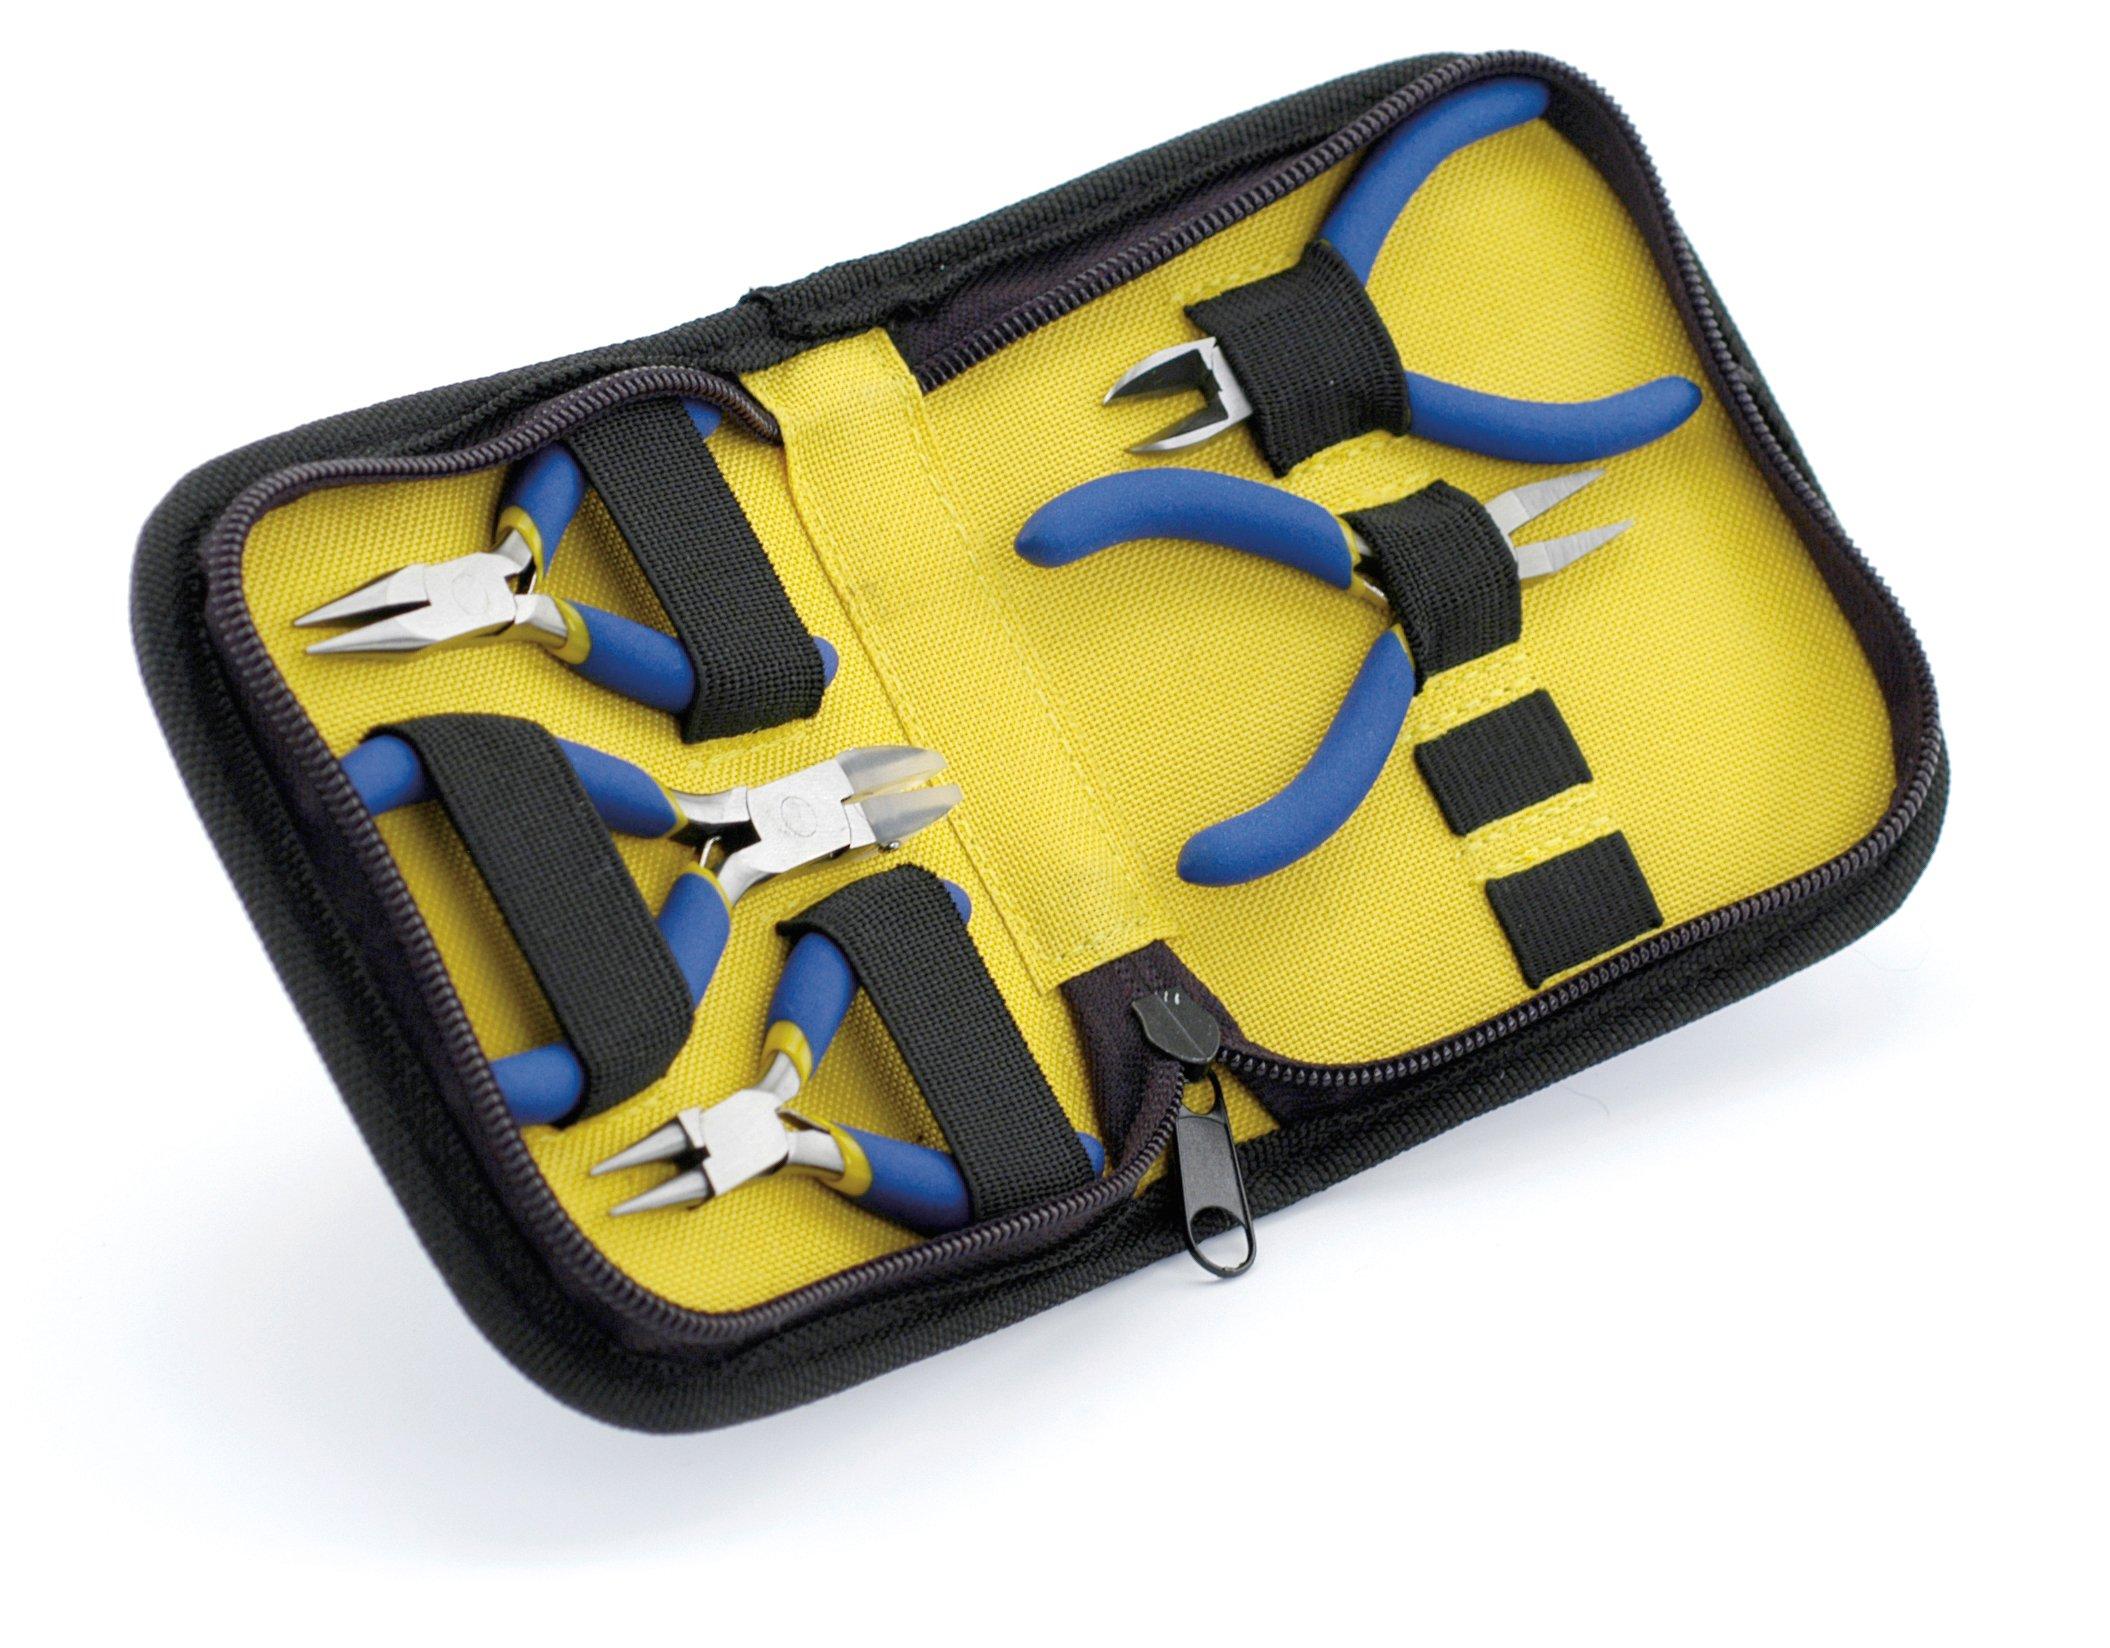 Beadalon 203K-050 5-Piece Mini Zip Pouch Tool Kit